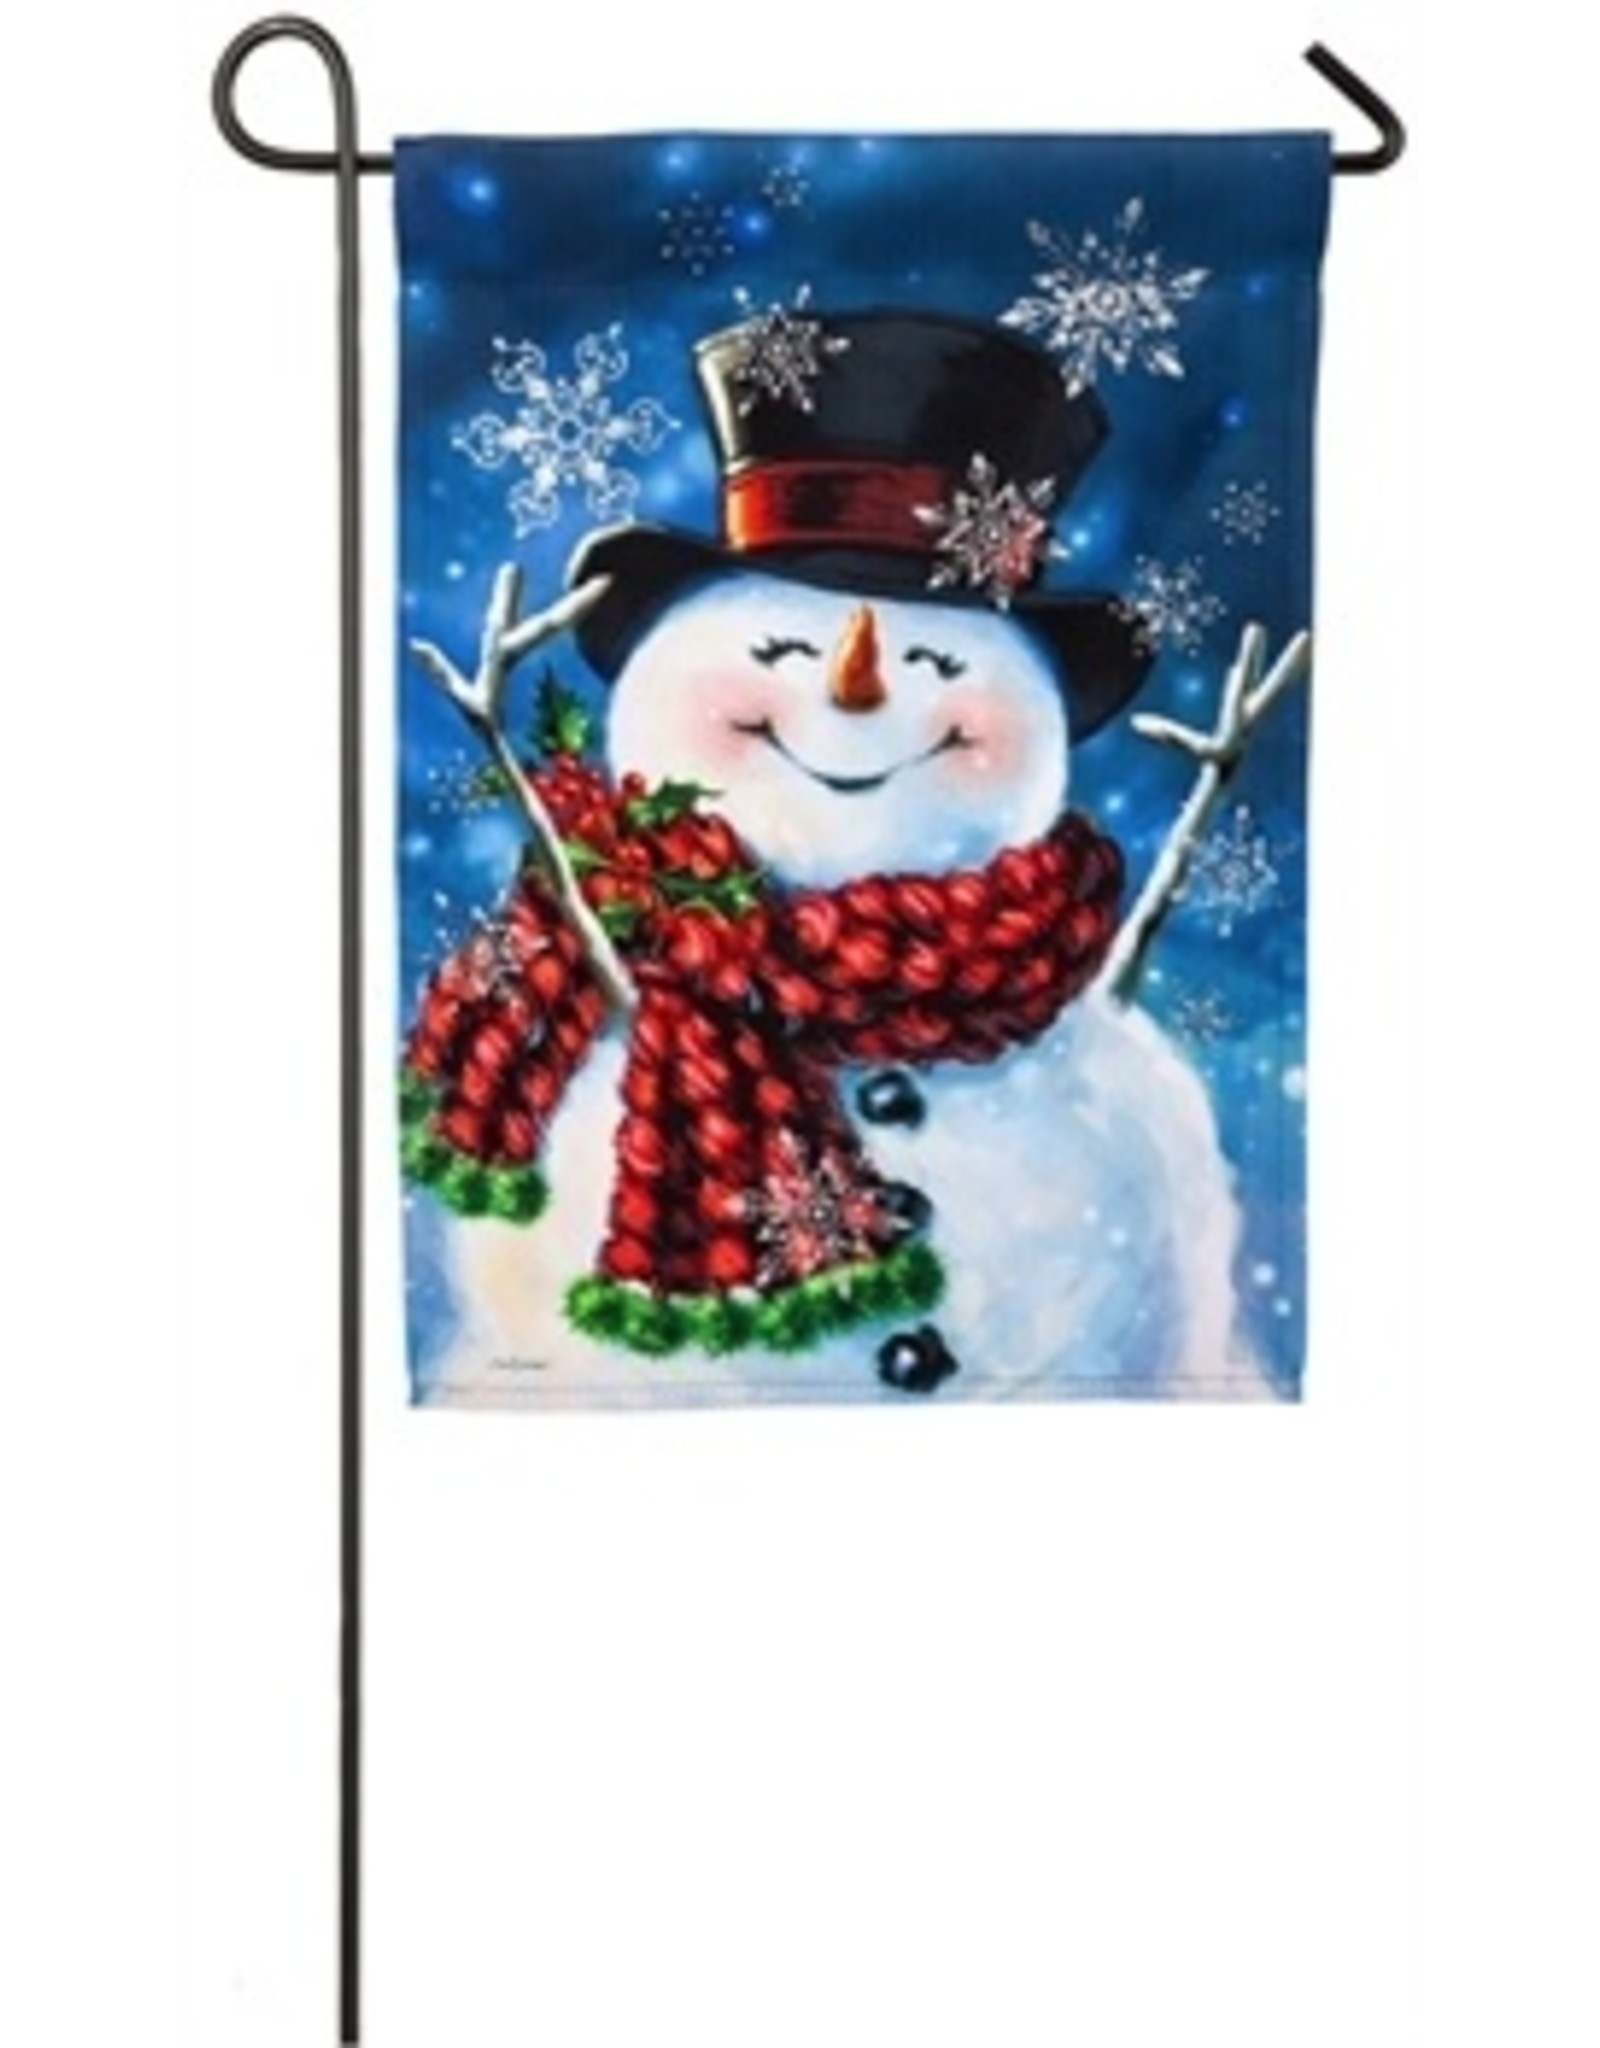 Evergreen Enterprises Joyful Jolly Snowman Garden Flag